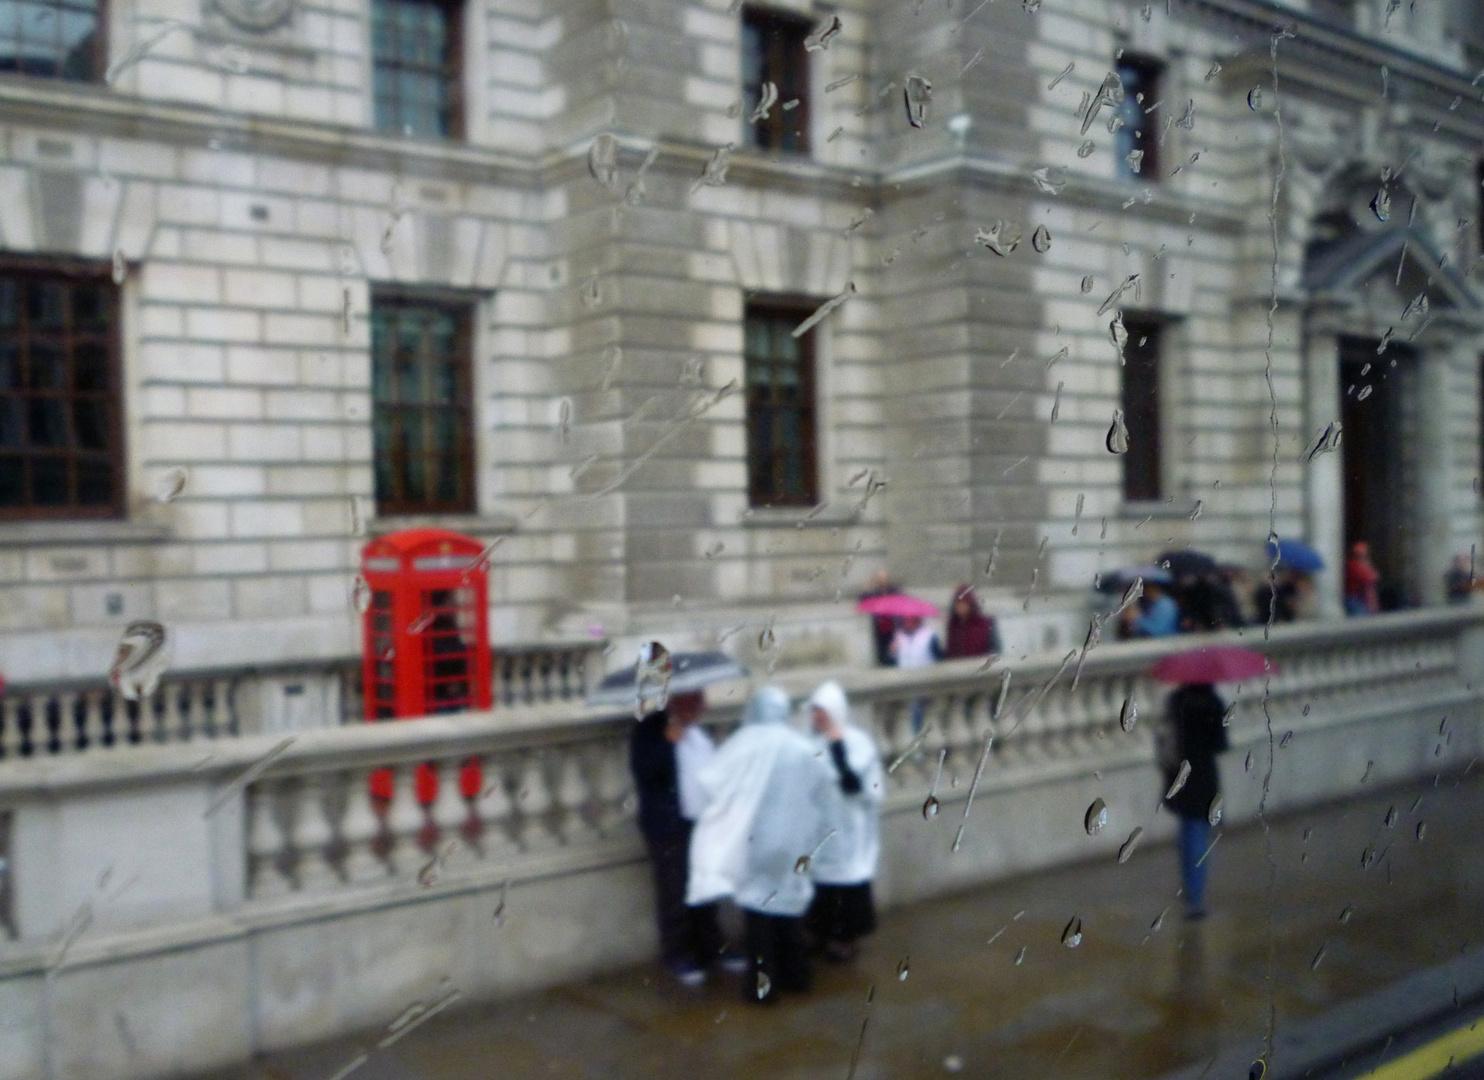 Rainy day in Pimlico